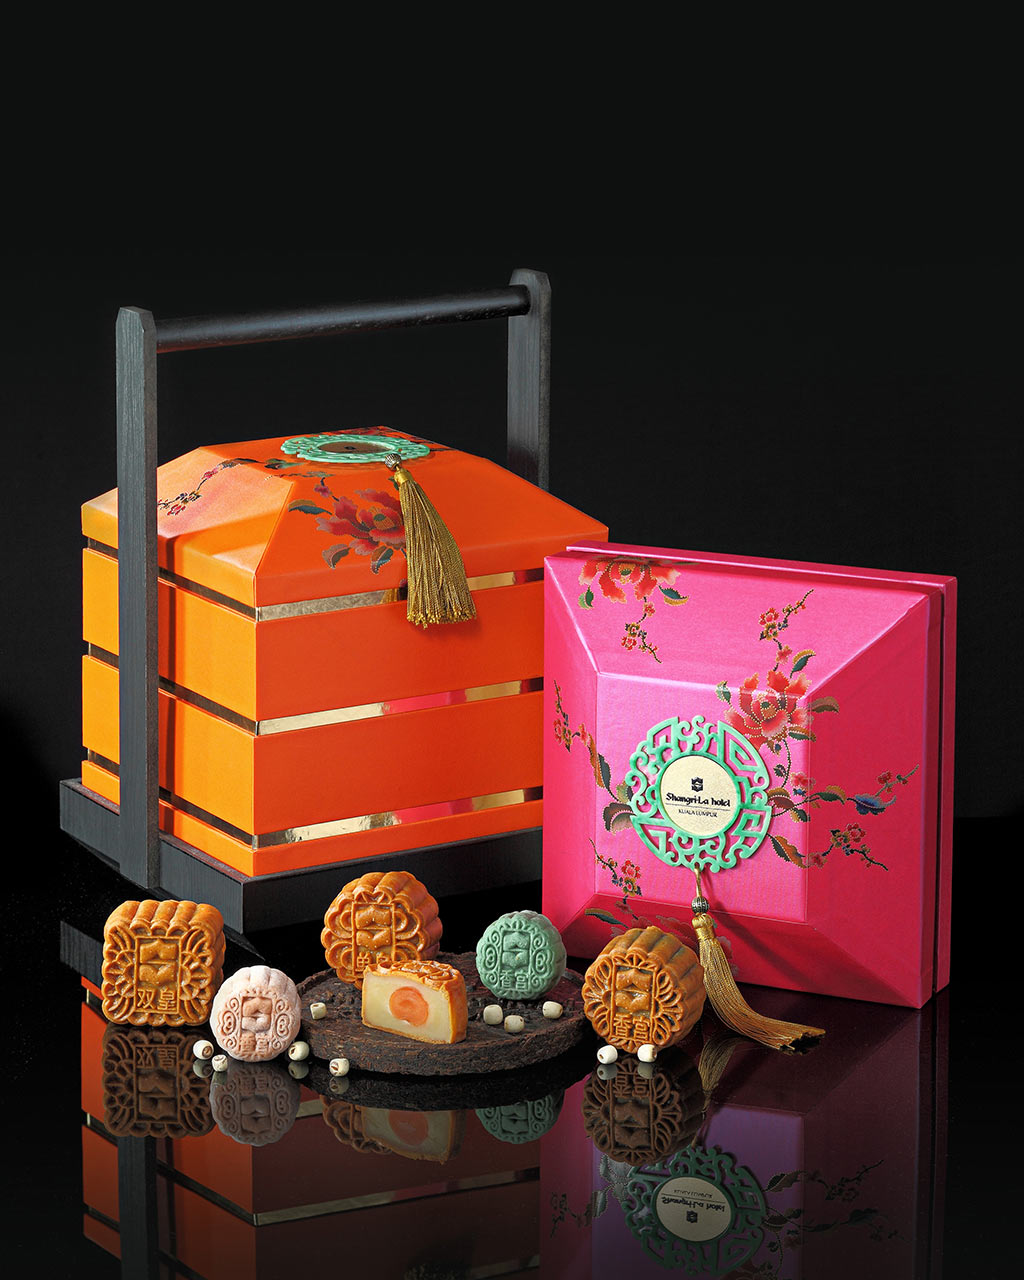 shangri-la mooncake2